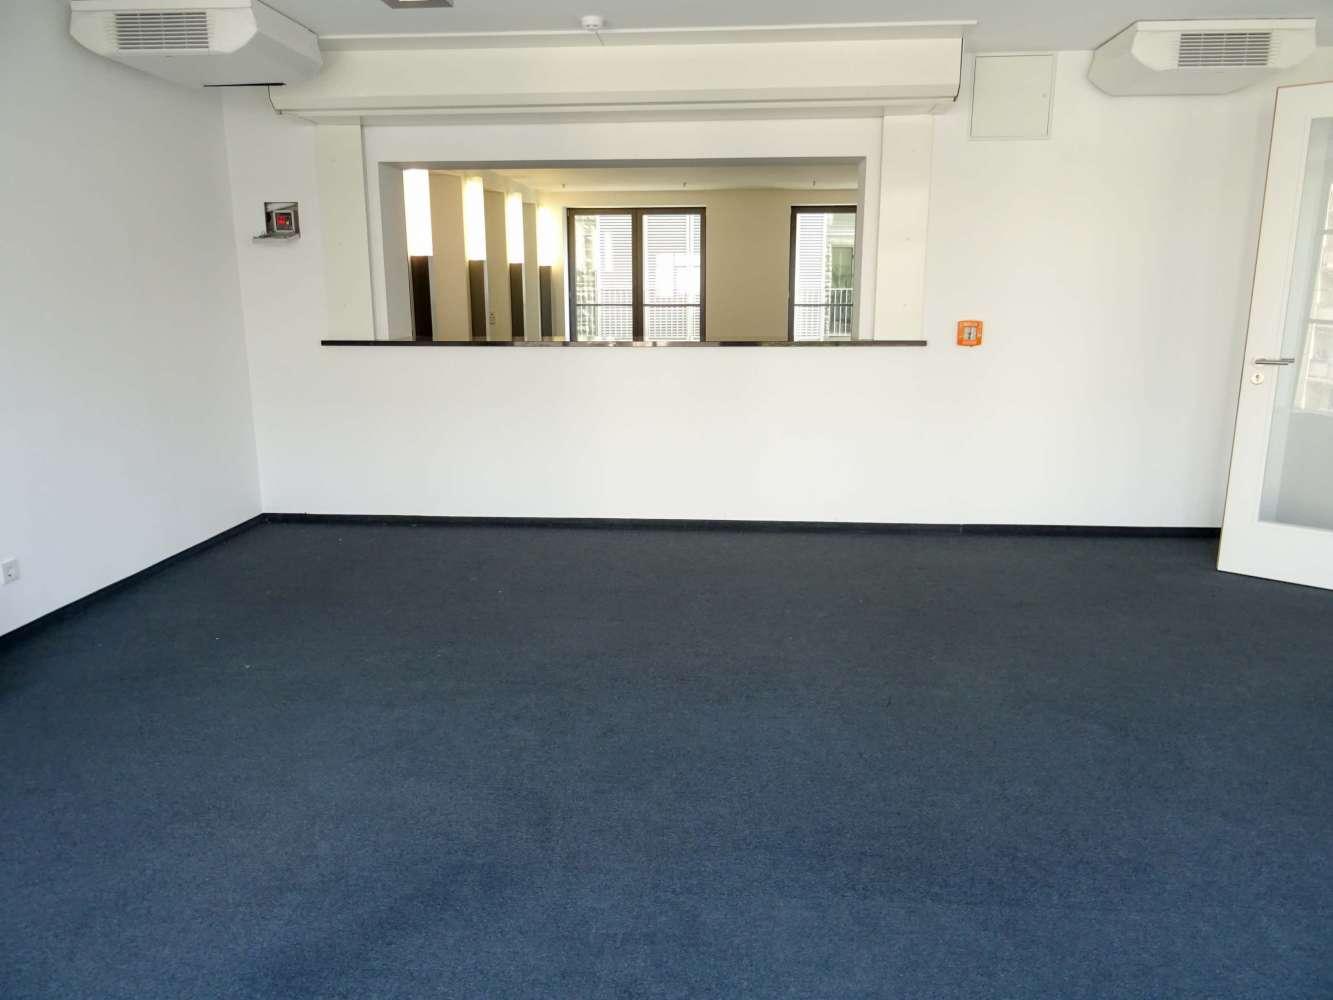 Büros Frankfurt am main, 60325 - Büro - Frankfurt am Main, Westend-Süd - F0148 - 10446360